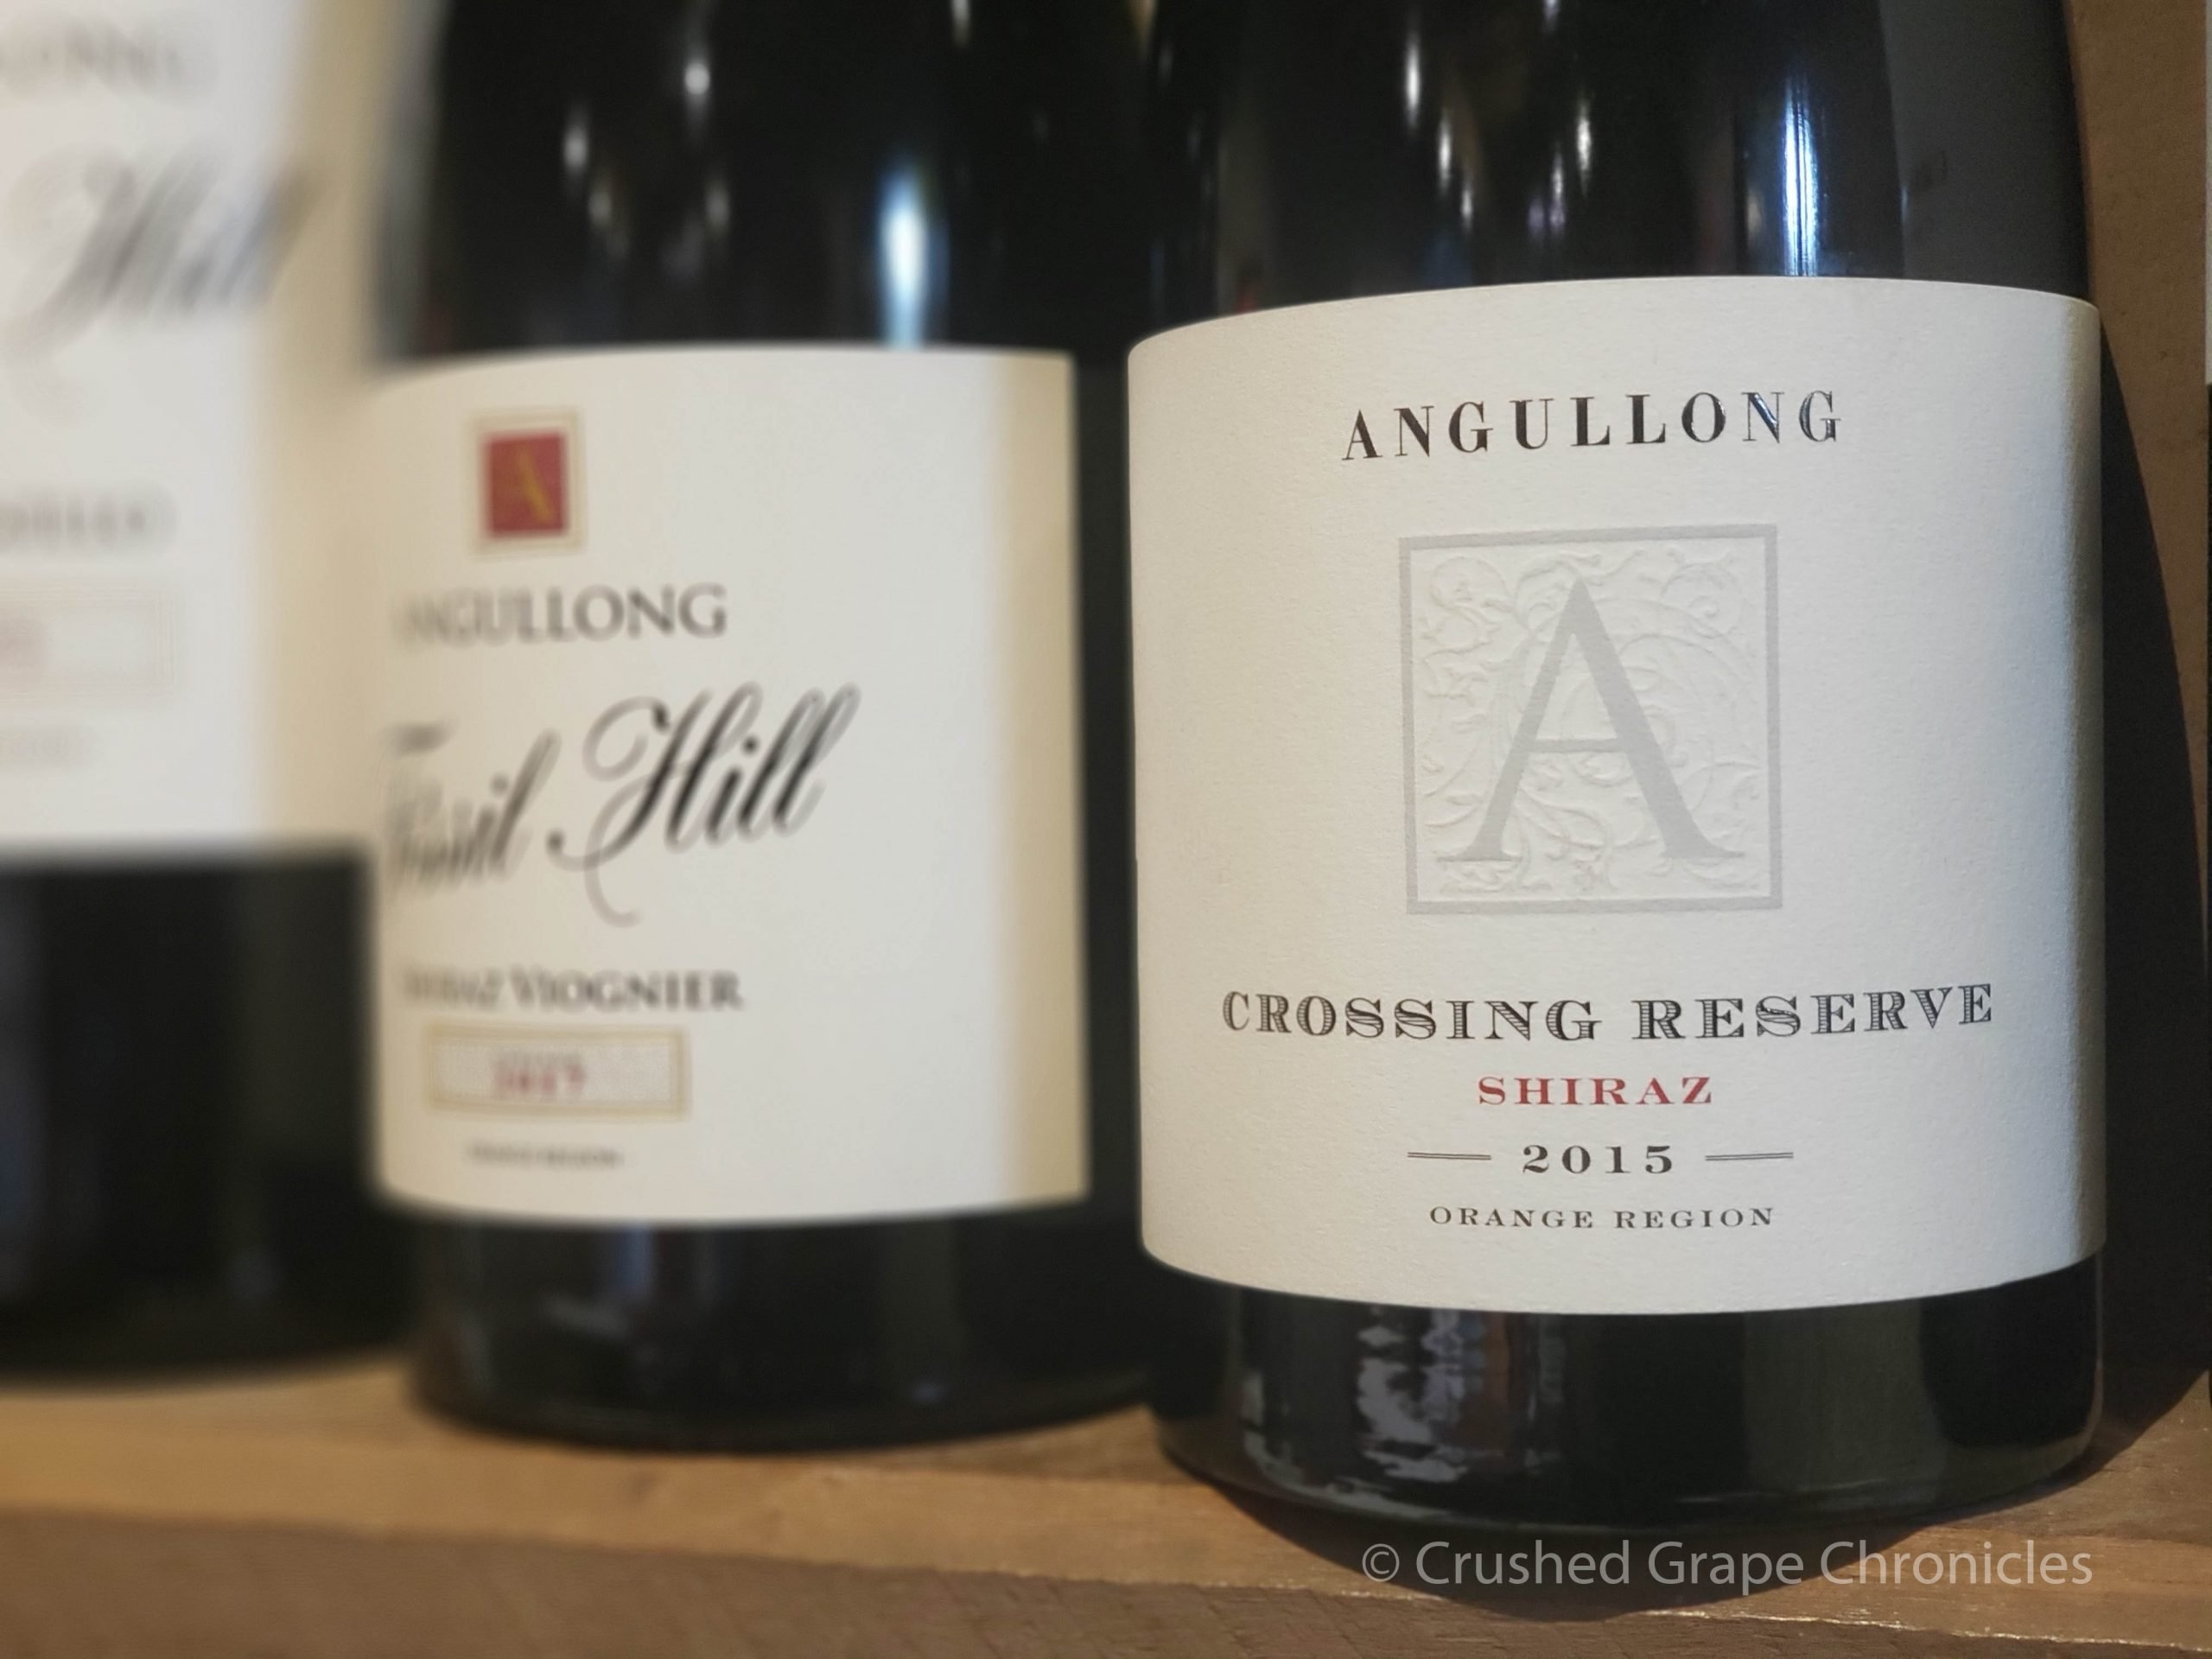 Angullong 2015 Crossing Reserve Shiraz at Angullong Vineyard in Cellar Door in Millthorpe, Orange NSW Australia